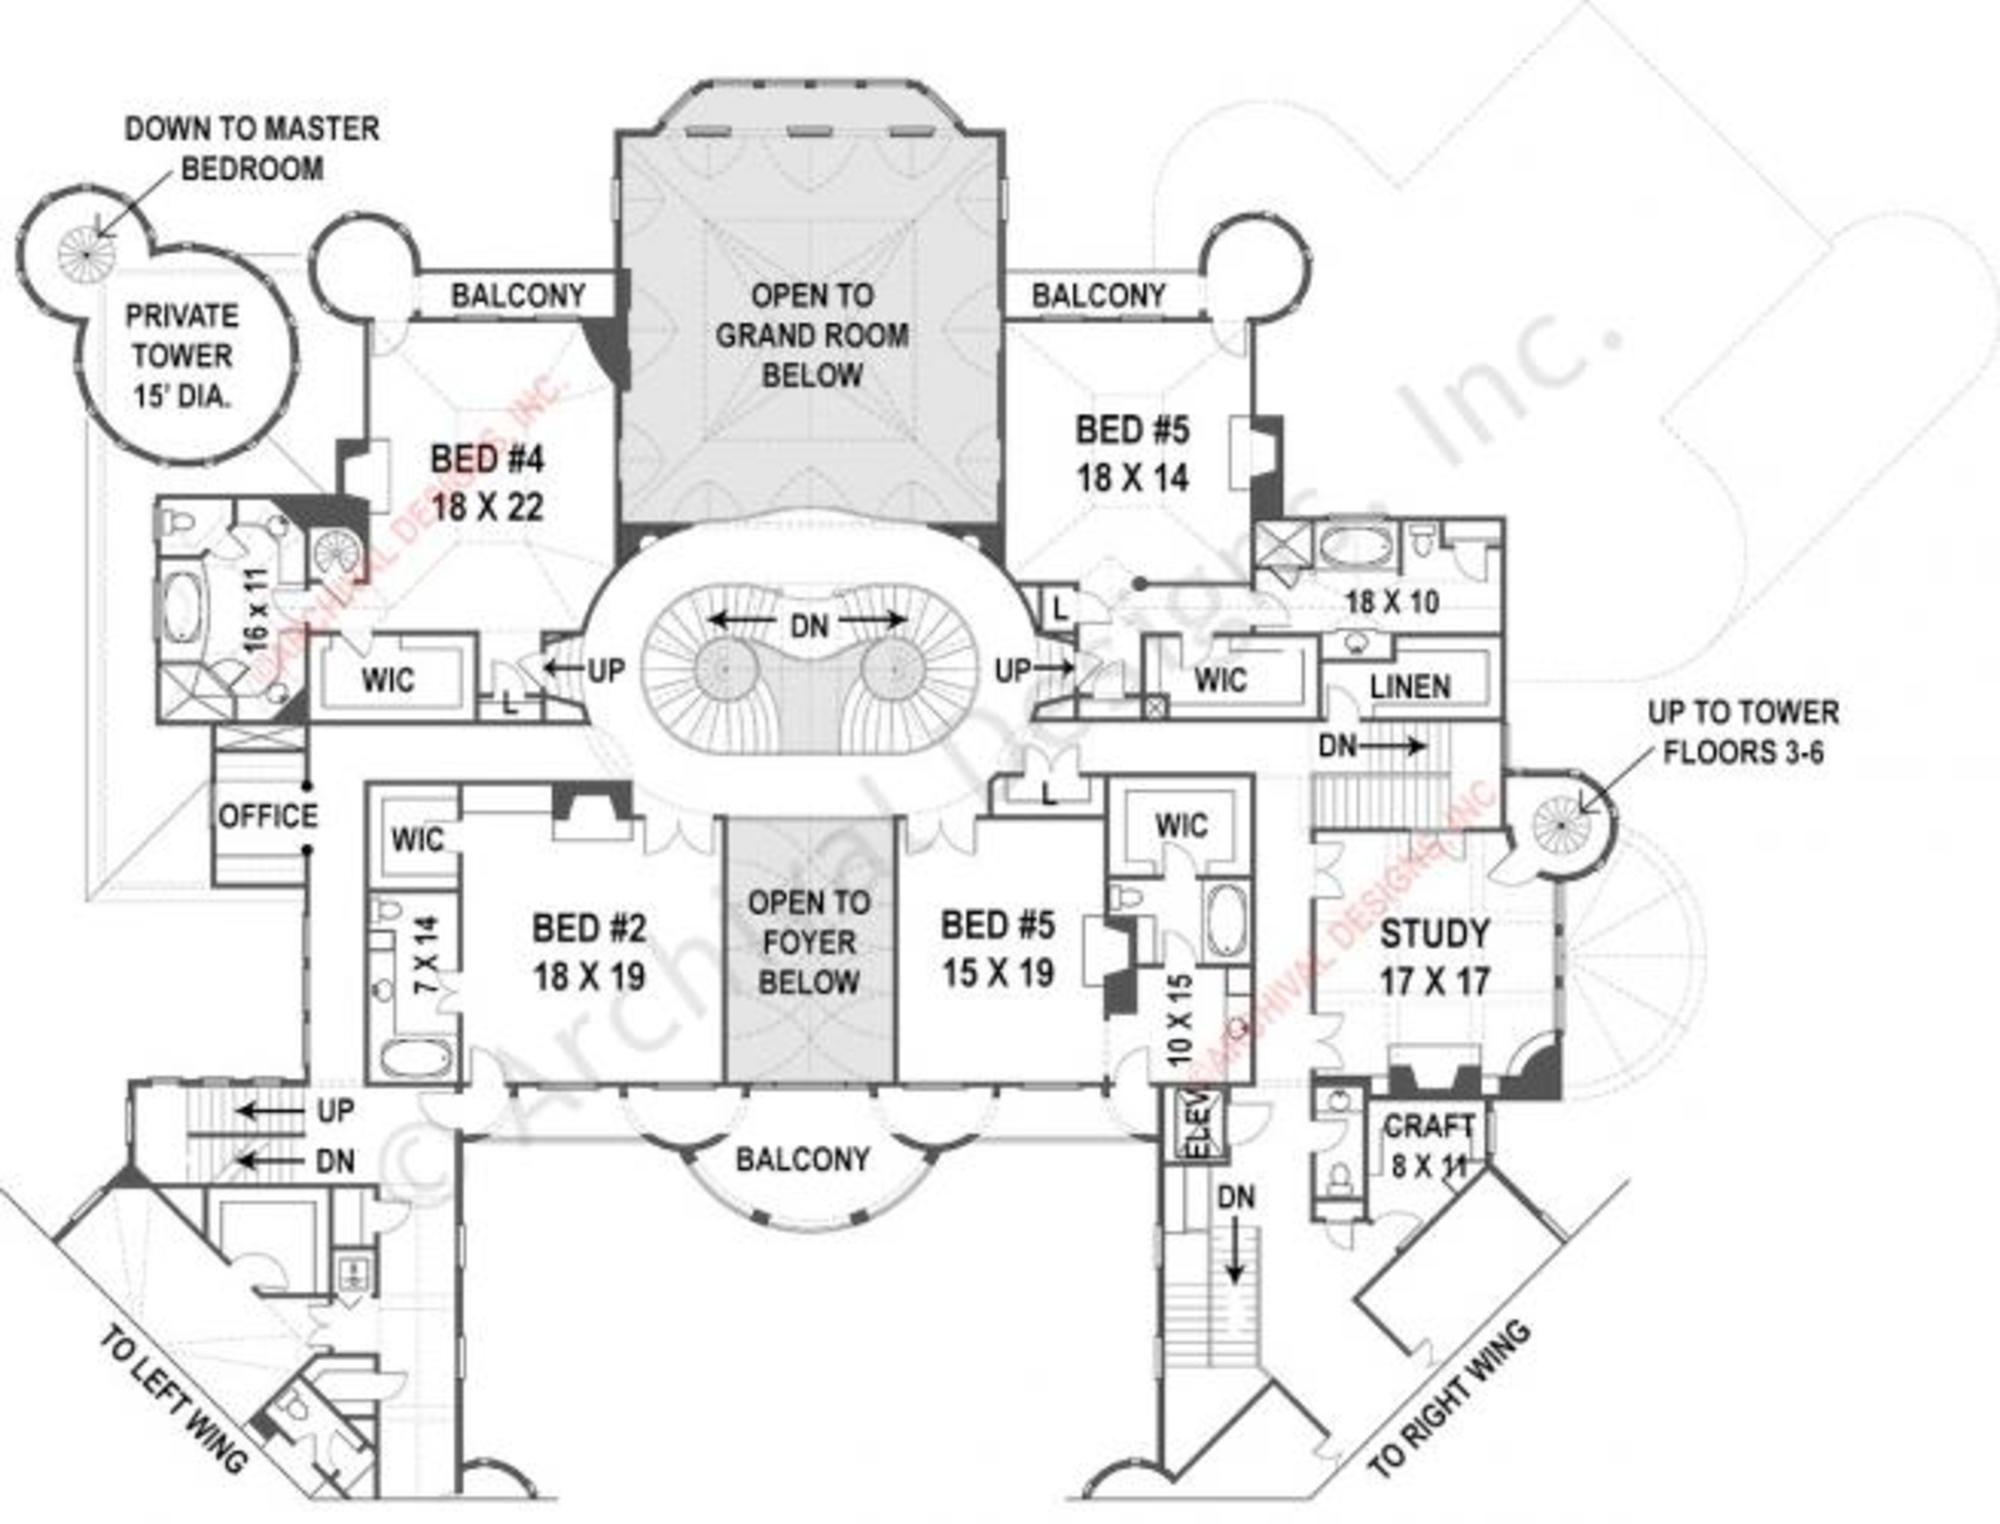 Balmoral House Plan Balmoral House House Plans Castle House Plans